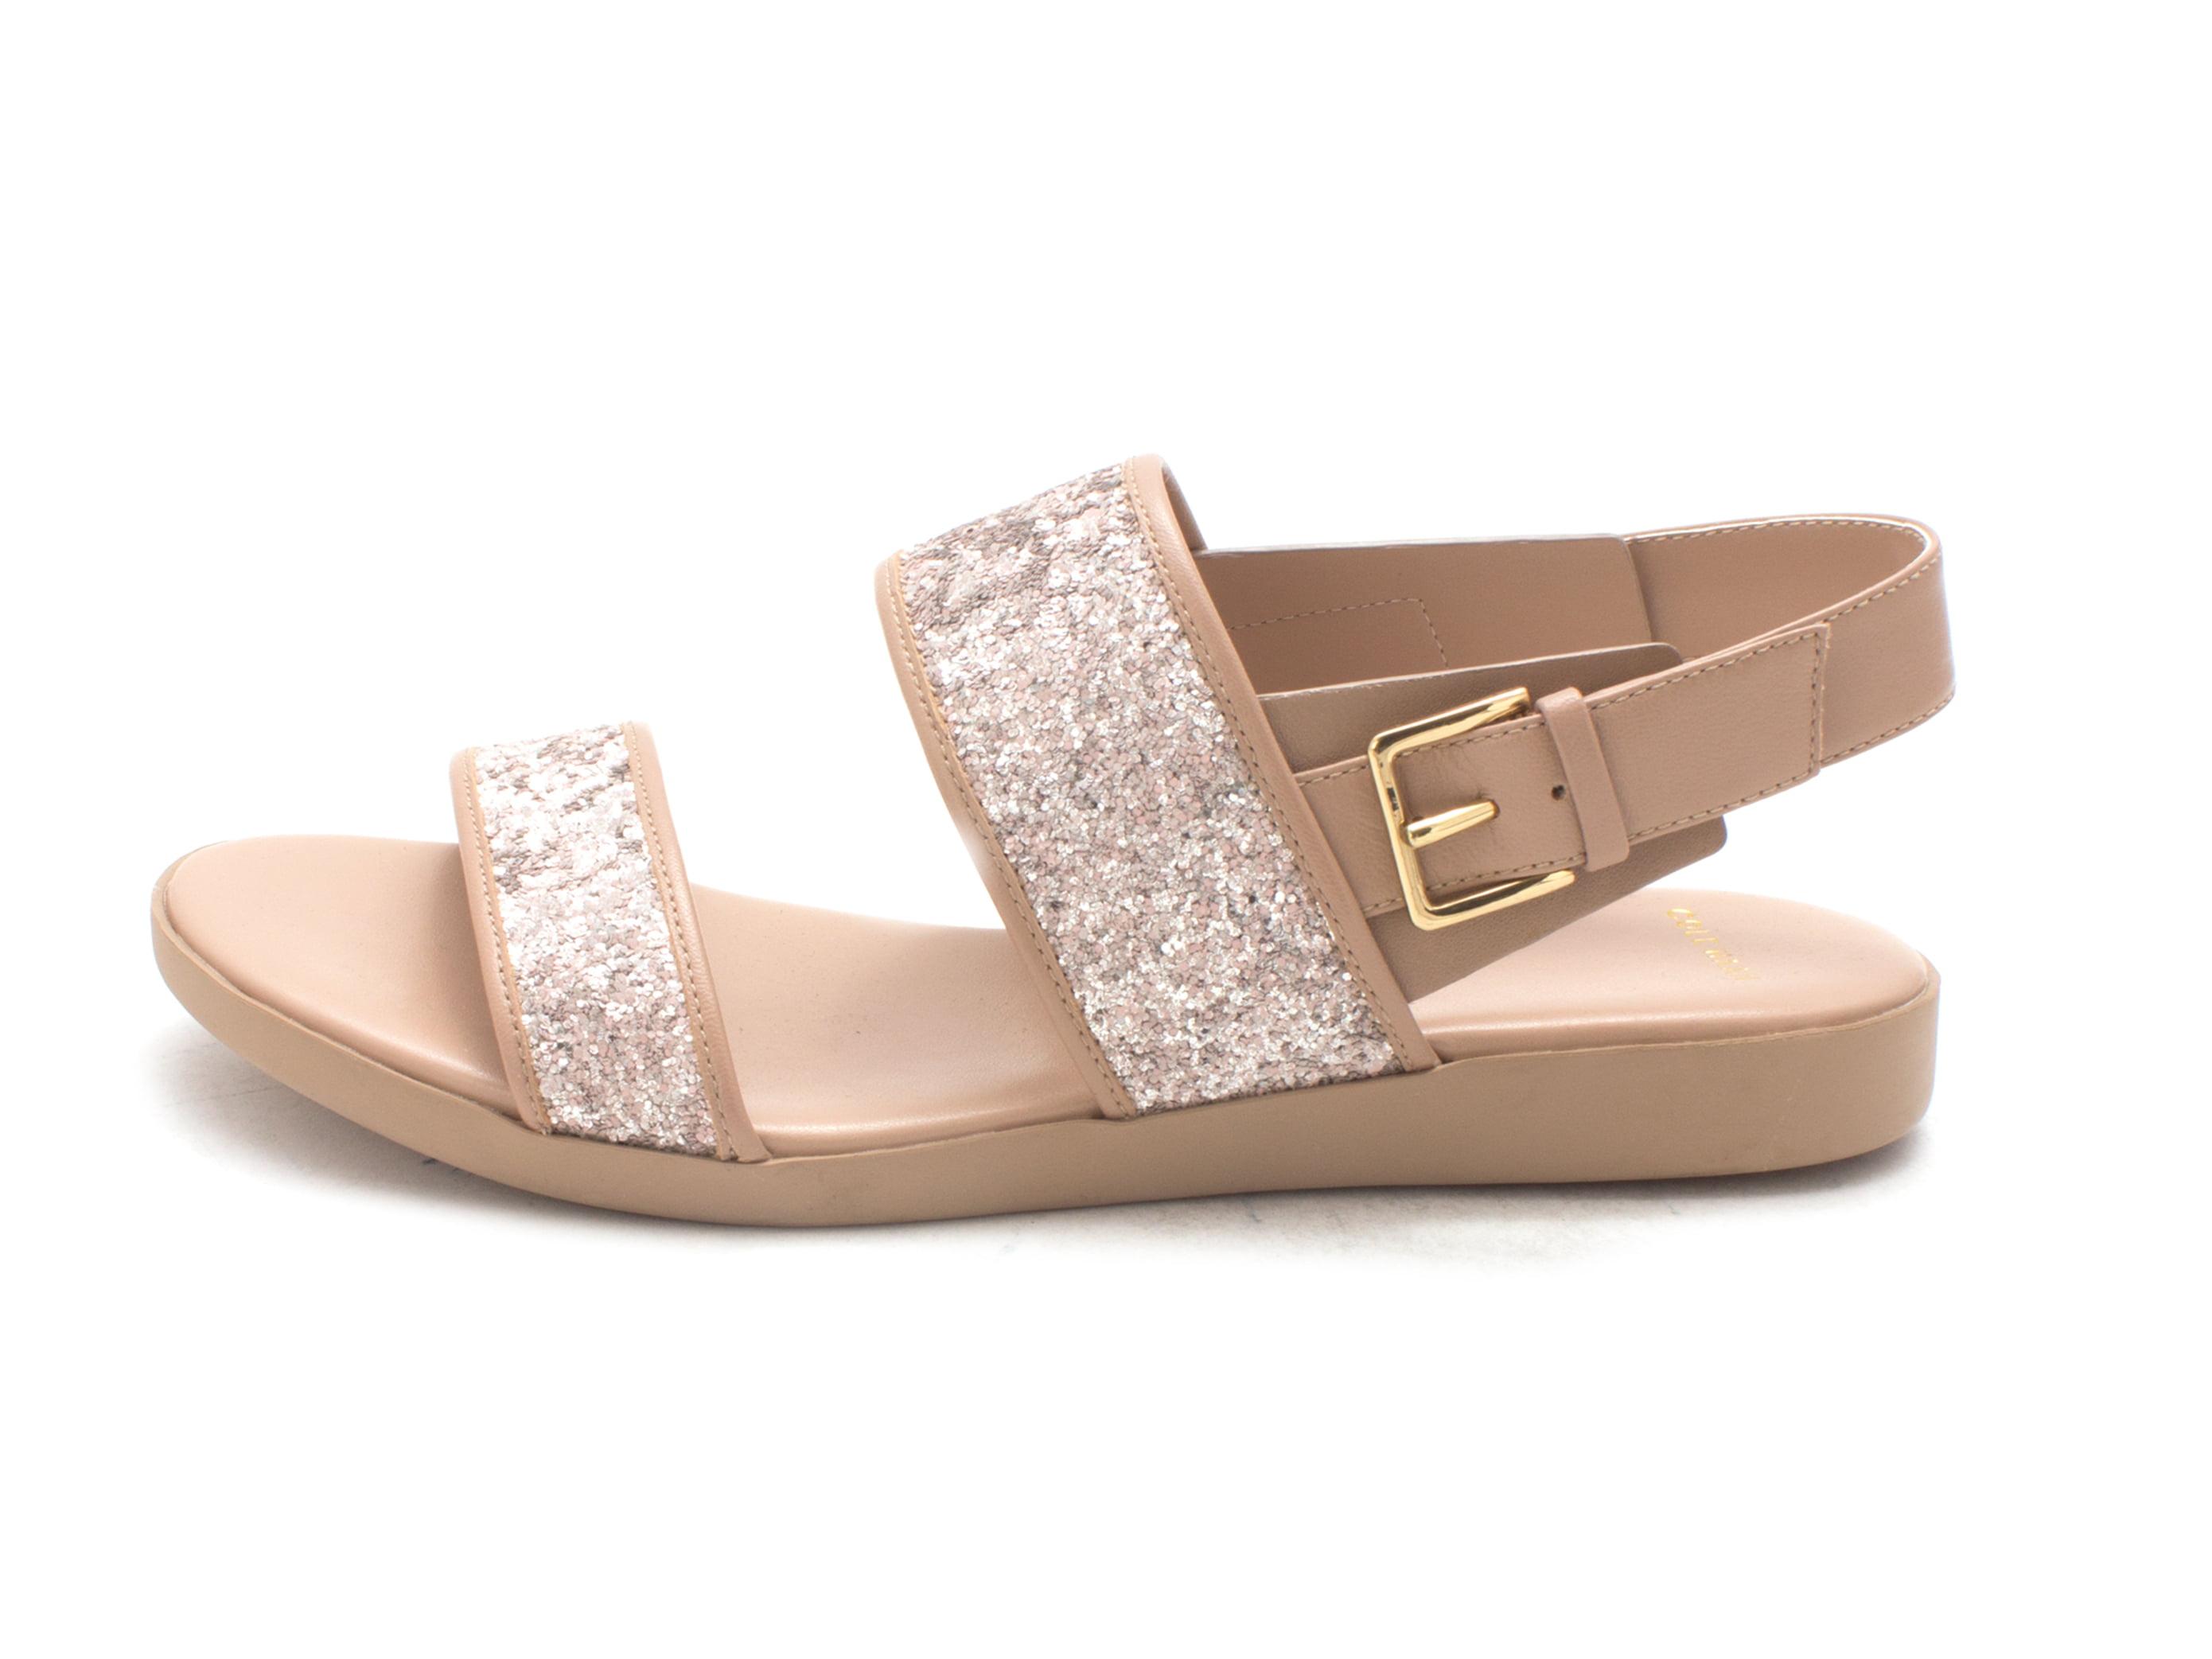 Cole Haan Womens Trusam Open Toe Casual Slingback, Tan/Glitter Upper, Size 6.0